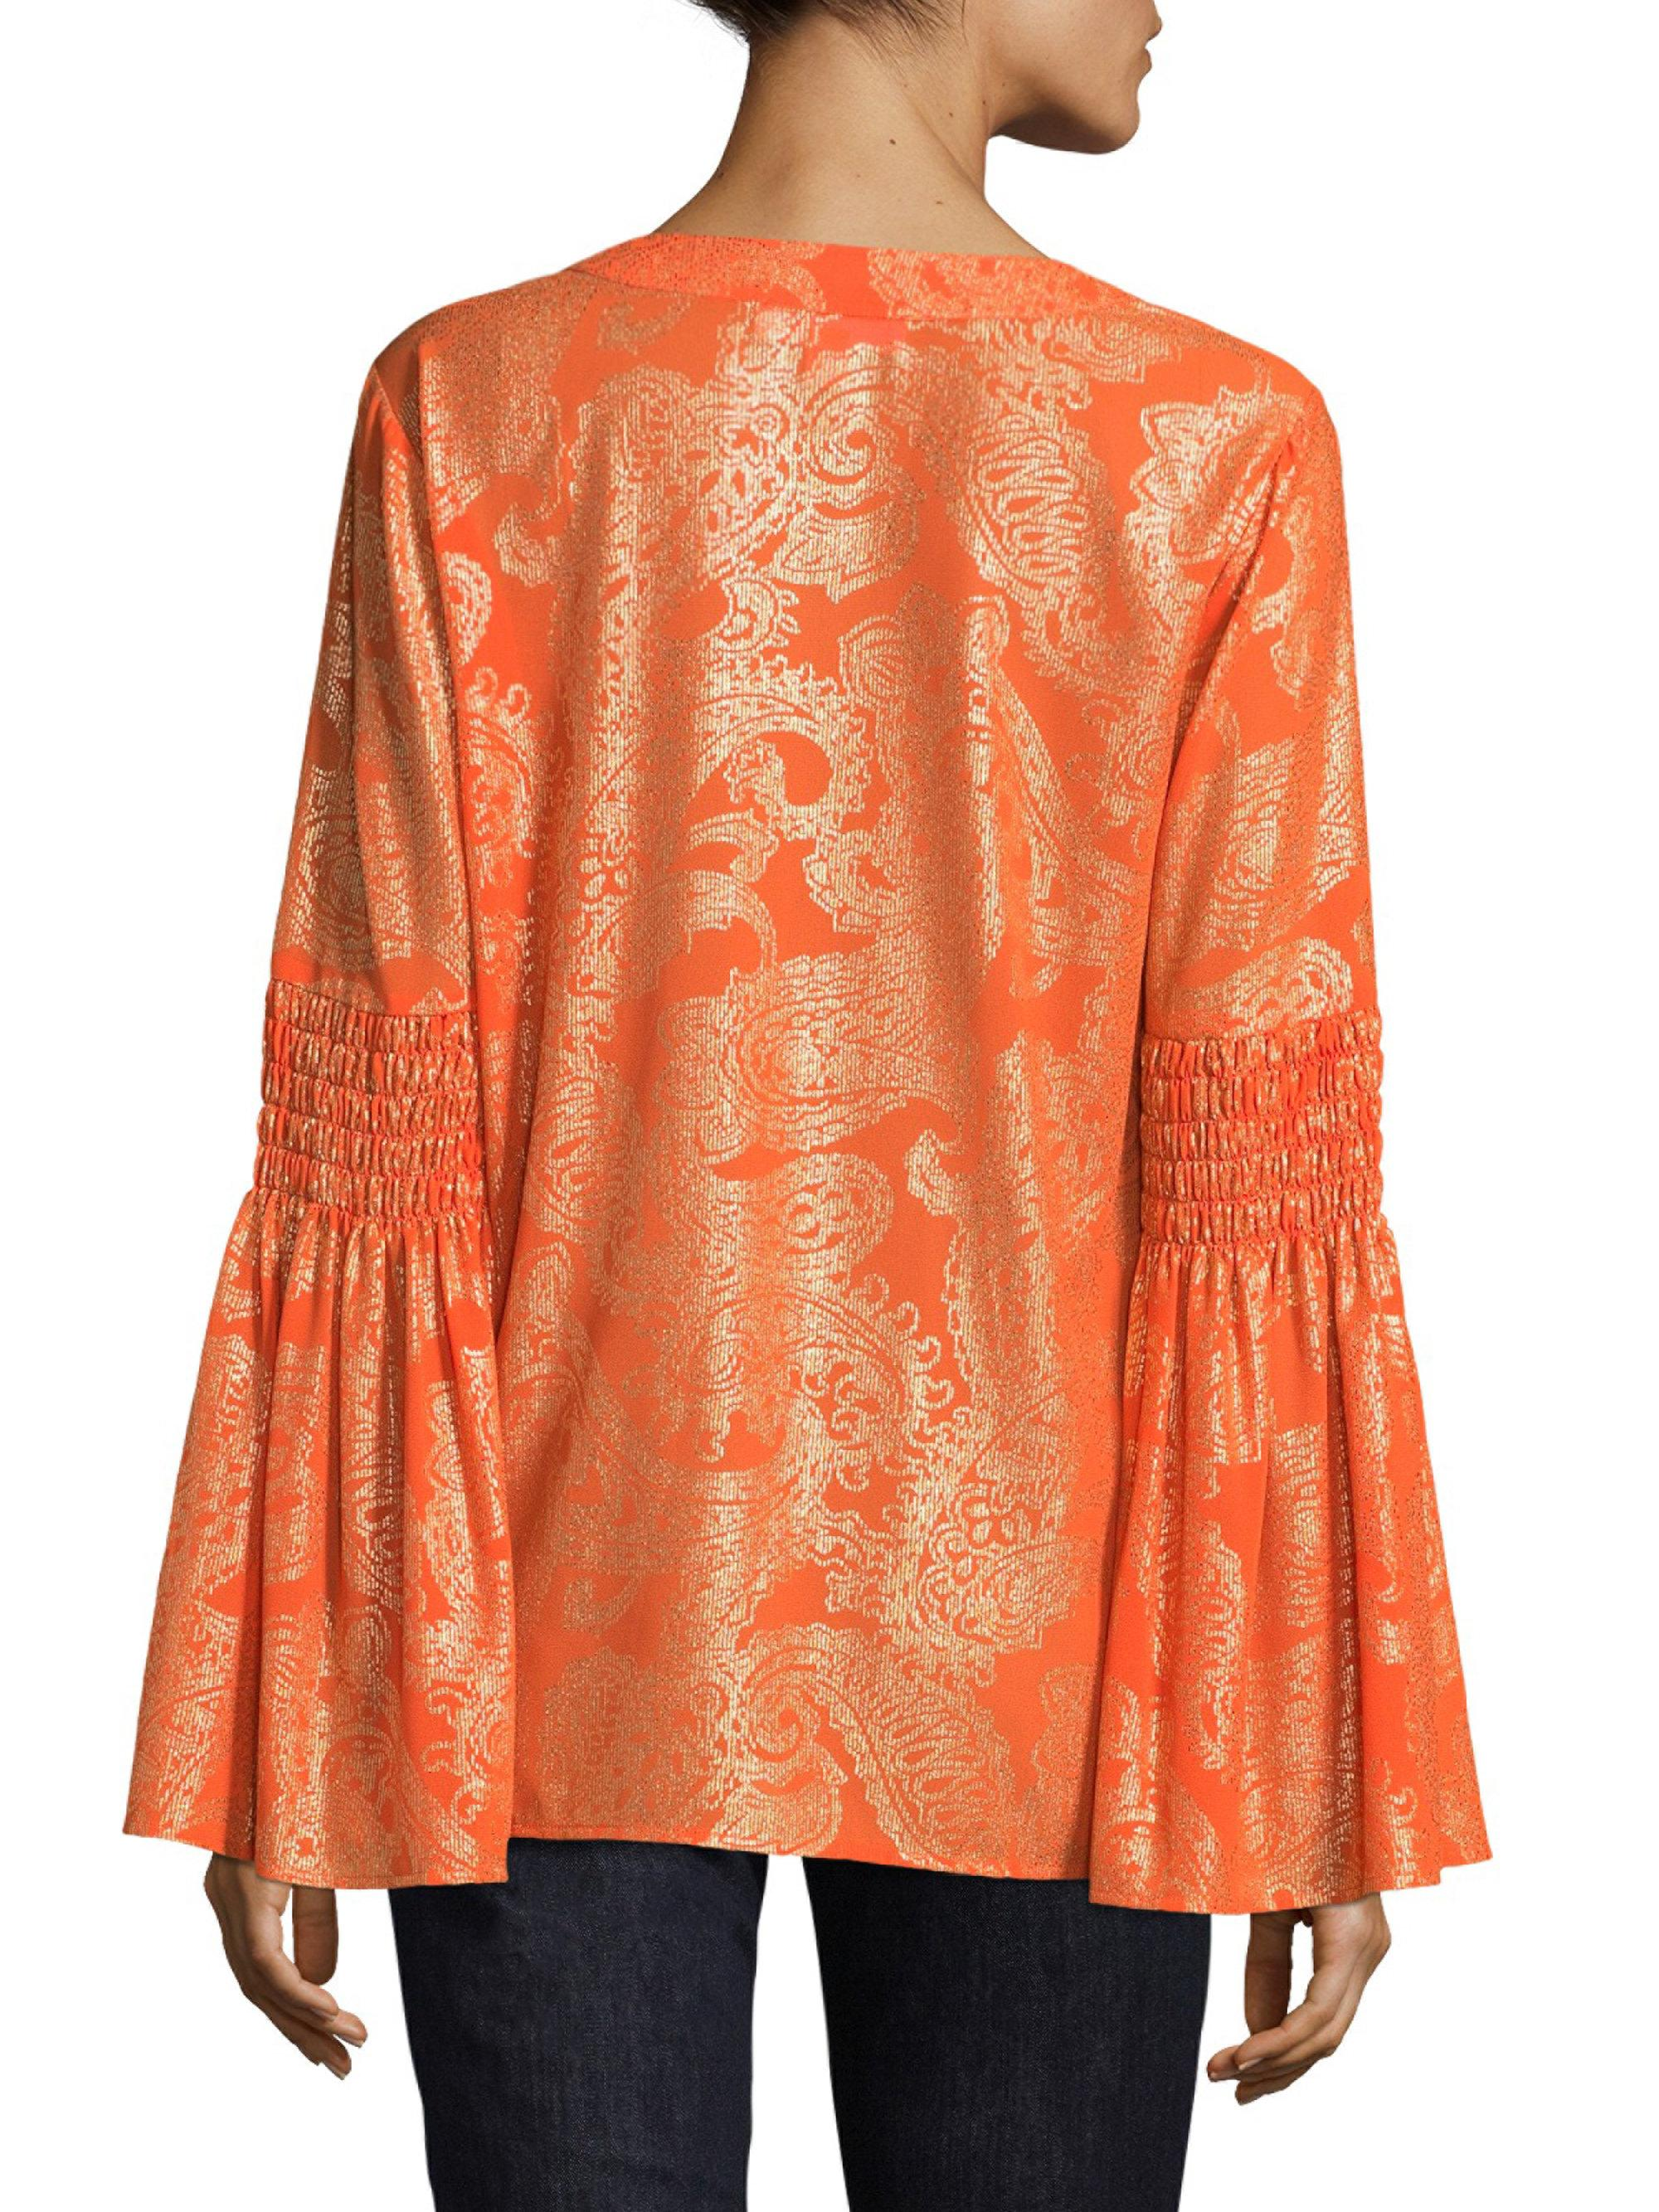 bf66e86a477 Lyst - MICHAEL Michael Kors Samara Bell Sleeves Blouse in Orange